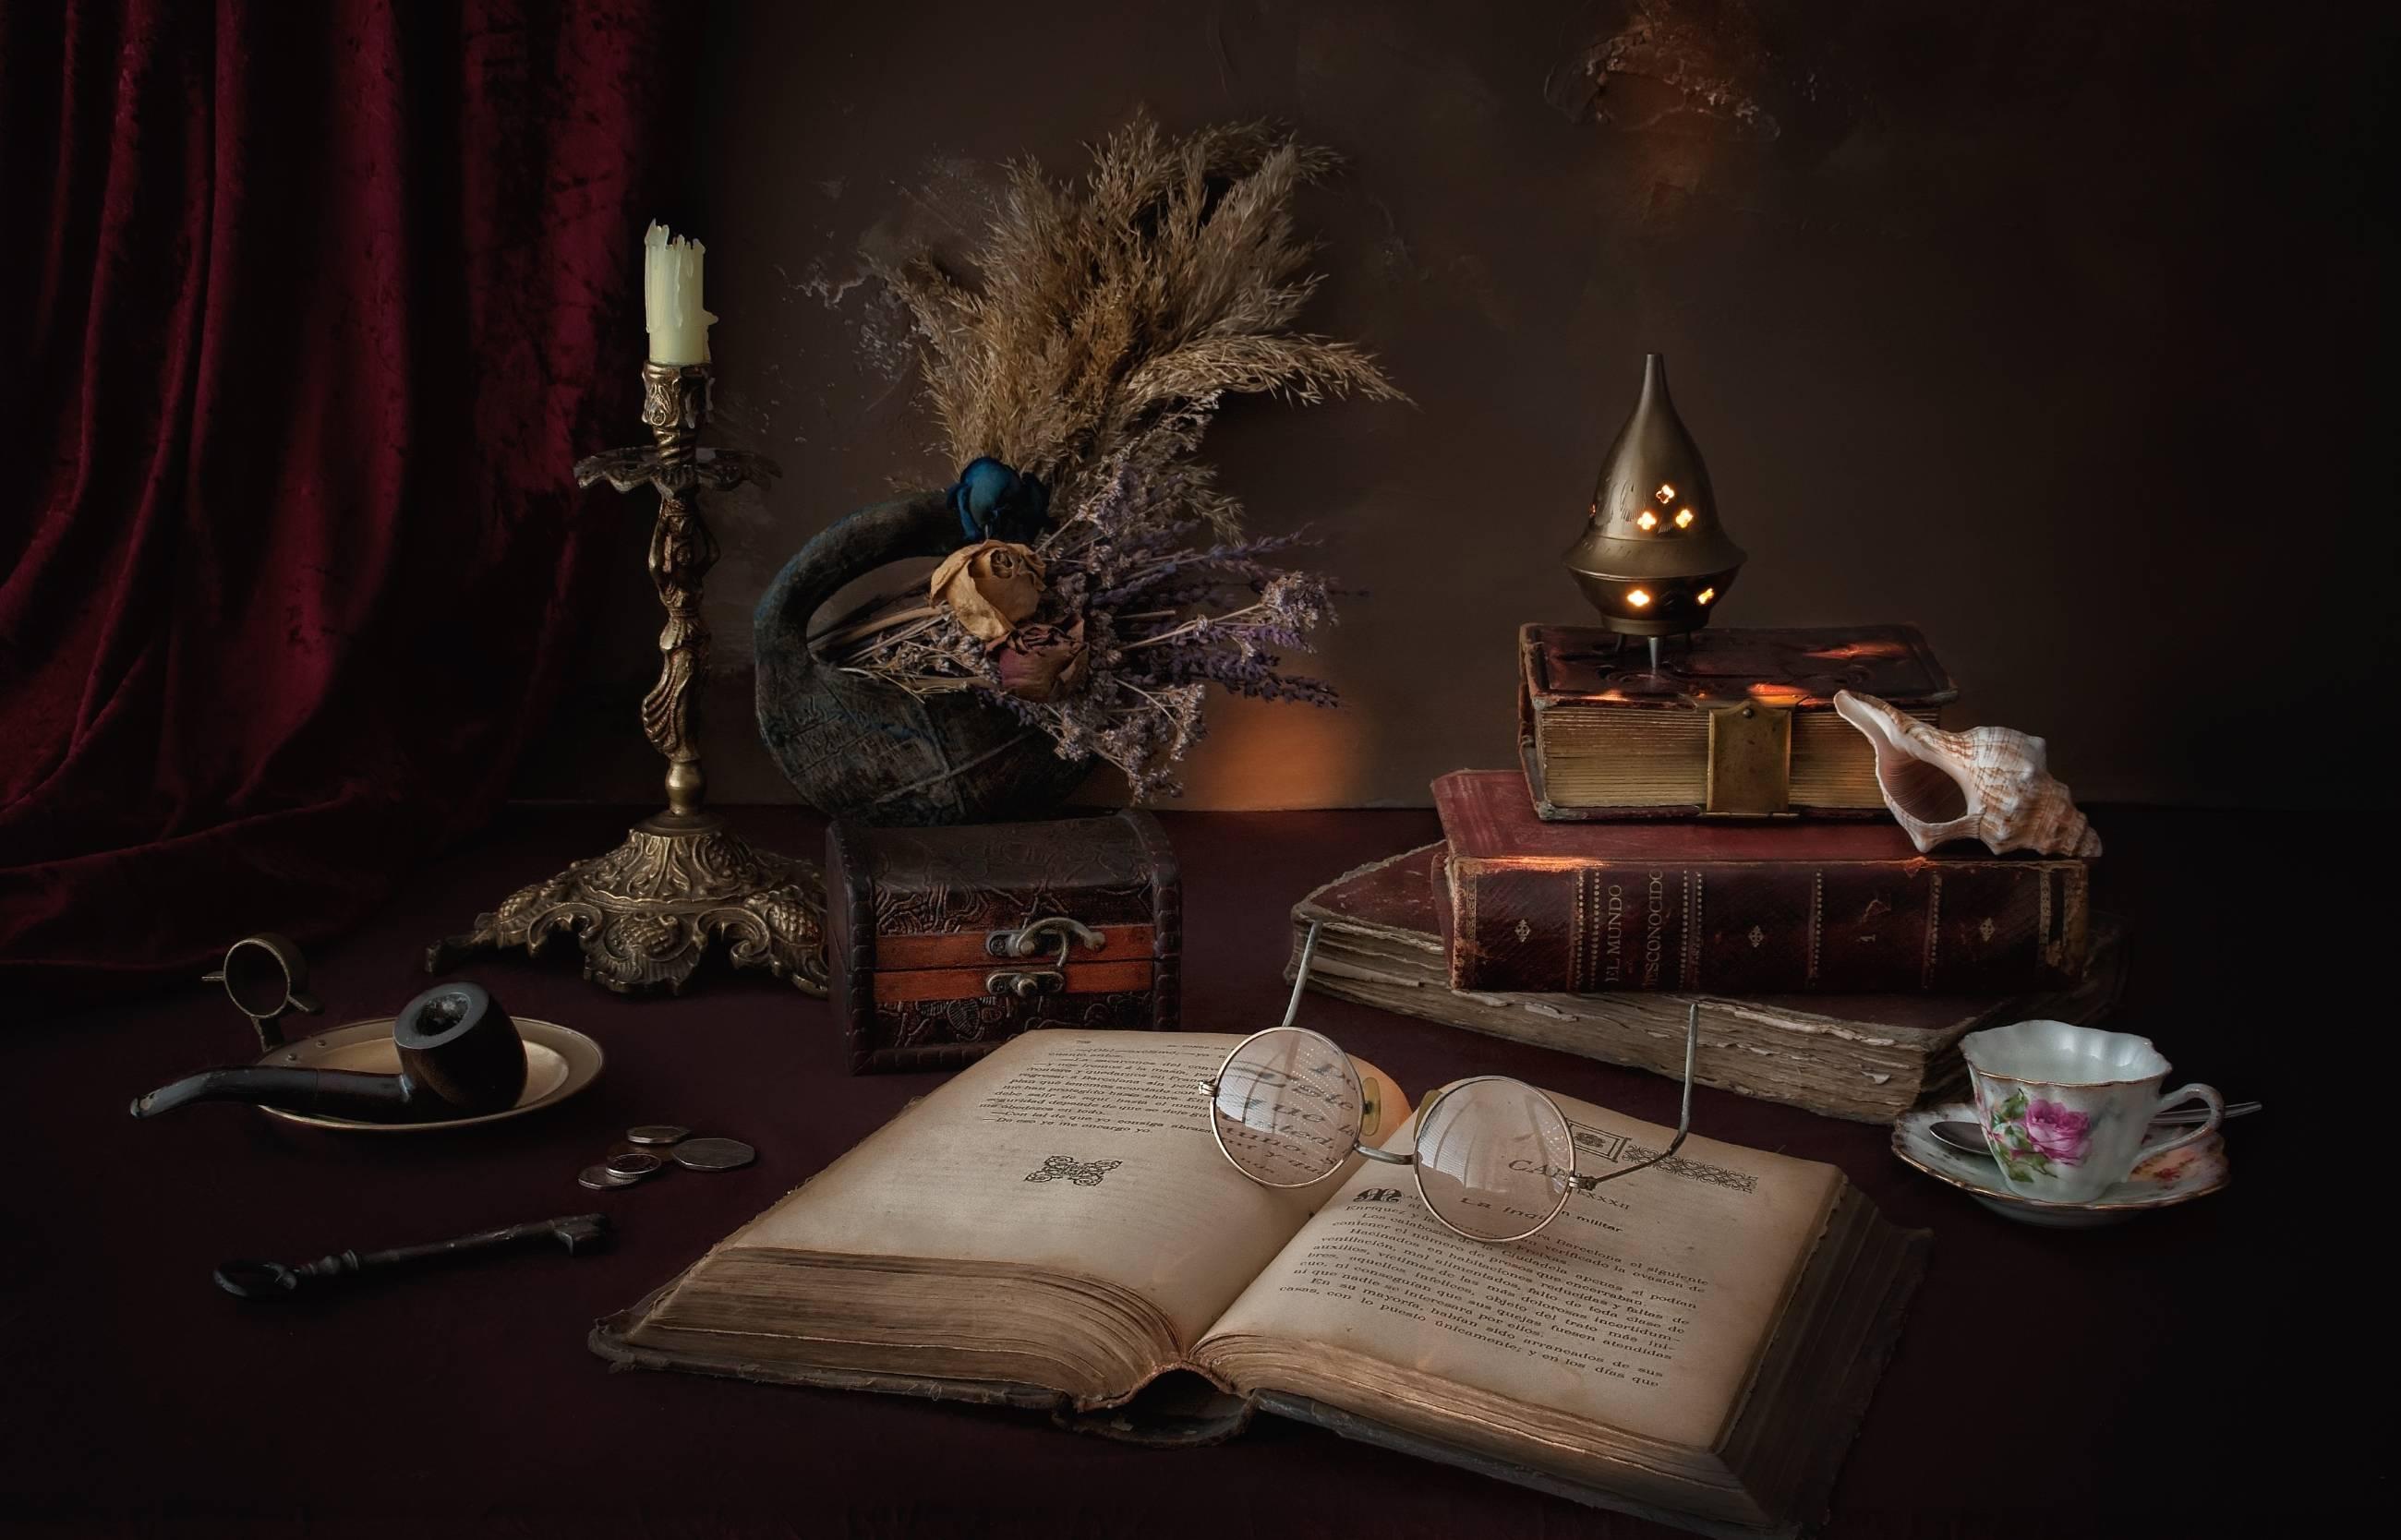 натюрморт, композиция, свеча